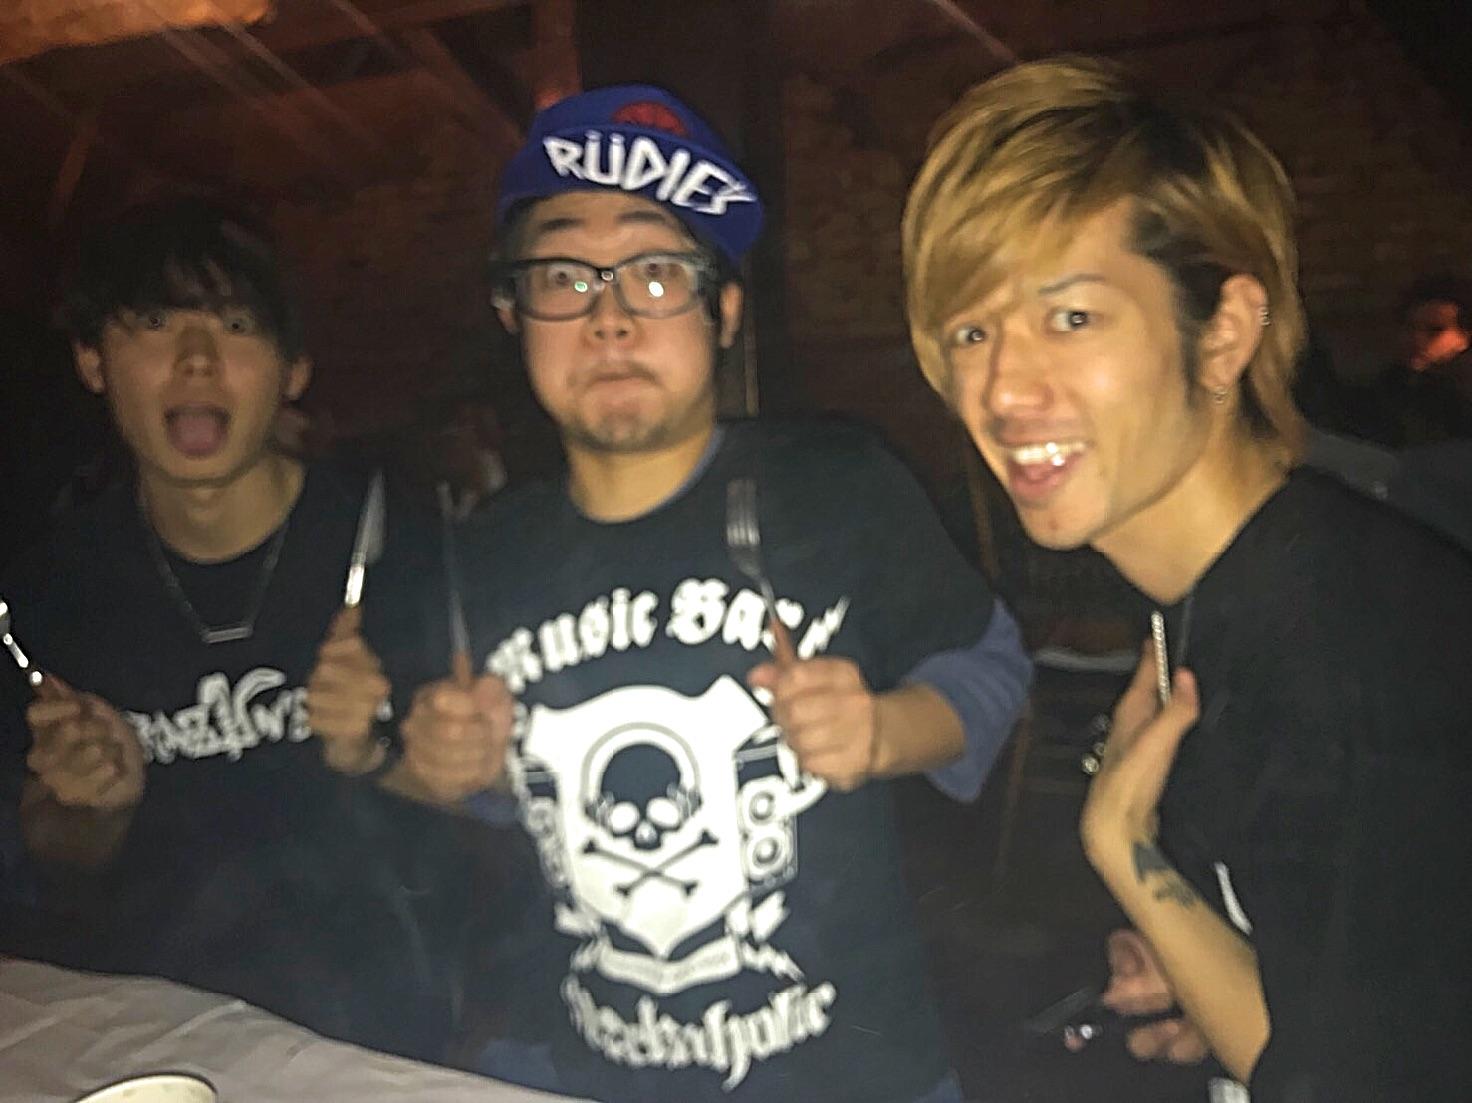 https://bar-rockaholic.jp/shibuya/blog/595BED26-362C-4F4E-8141-3BC2C80F2D8E.jpeg